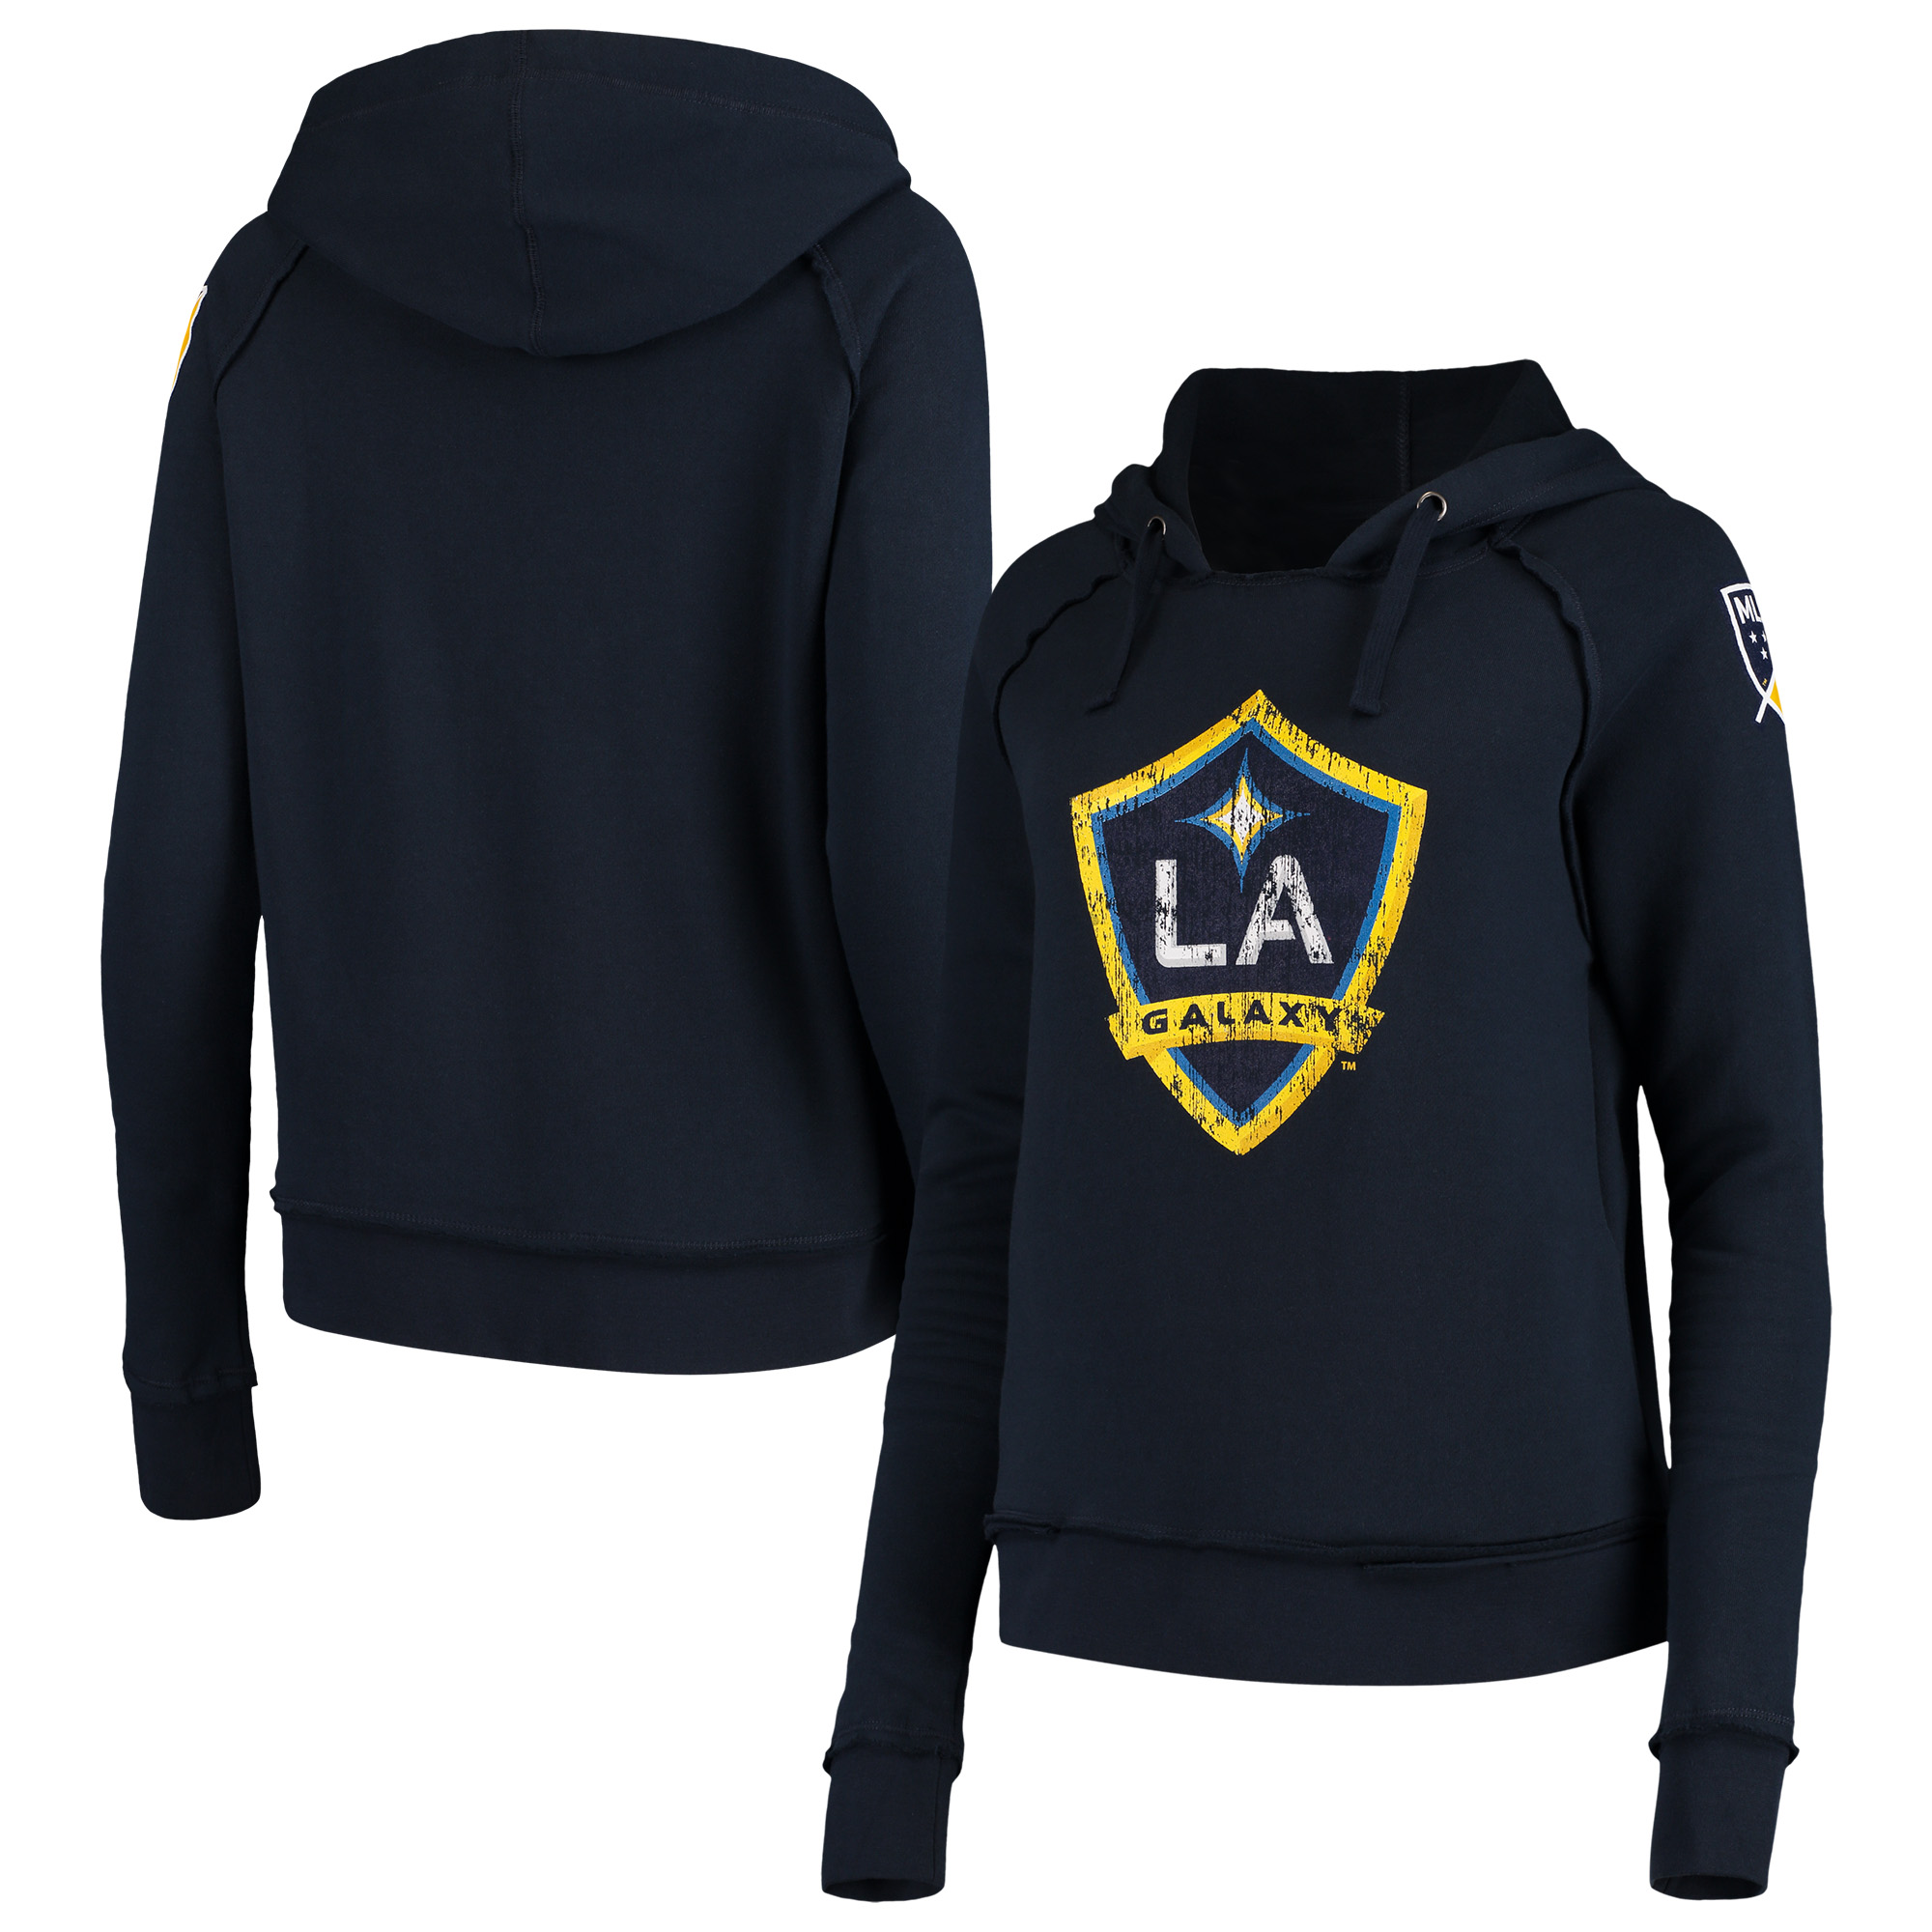 LA Galaxy 5th & Ocean by New Era Women's Brushed Fleece Pullover Hoodie - Navy